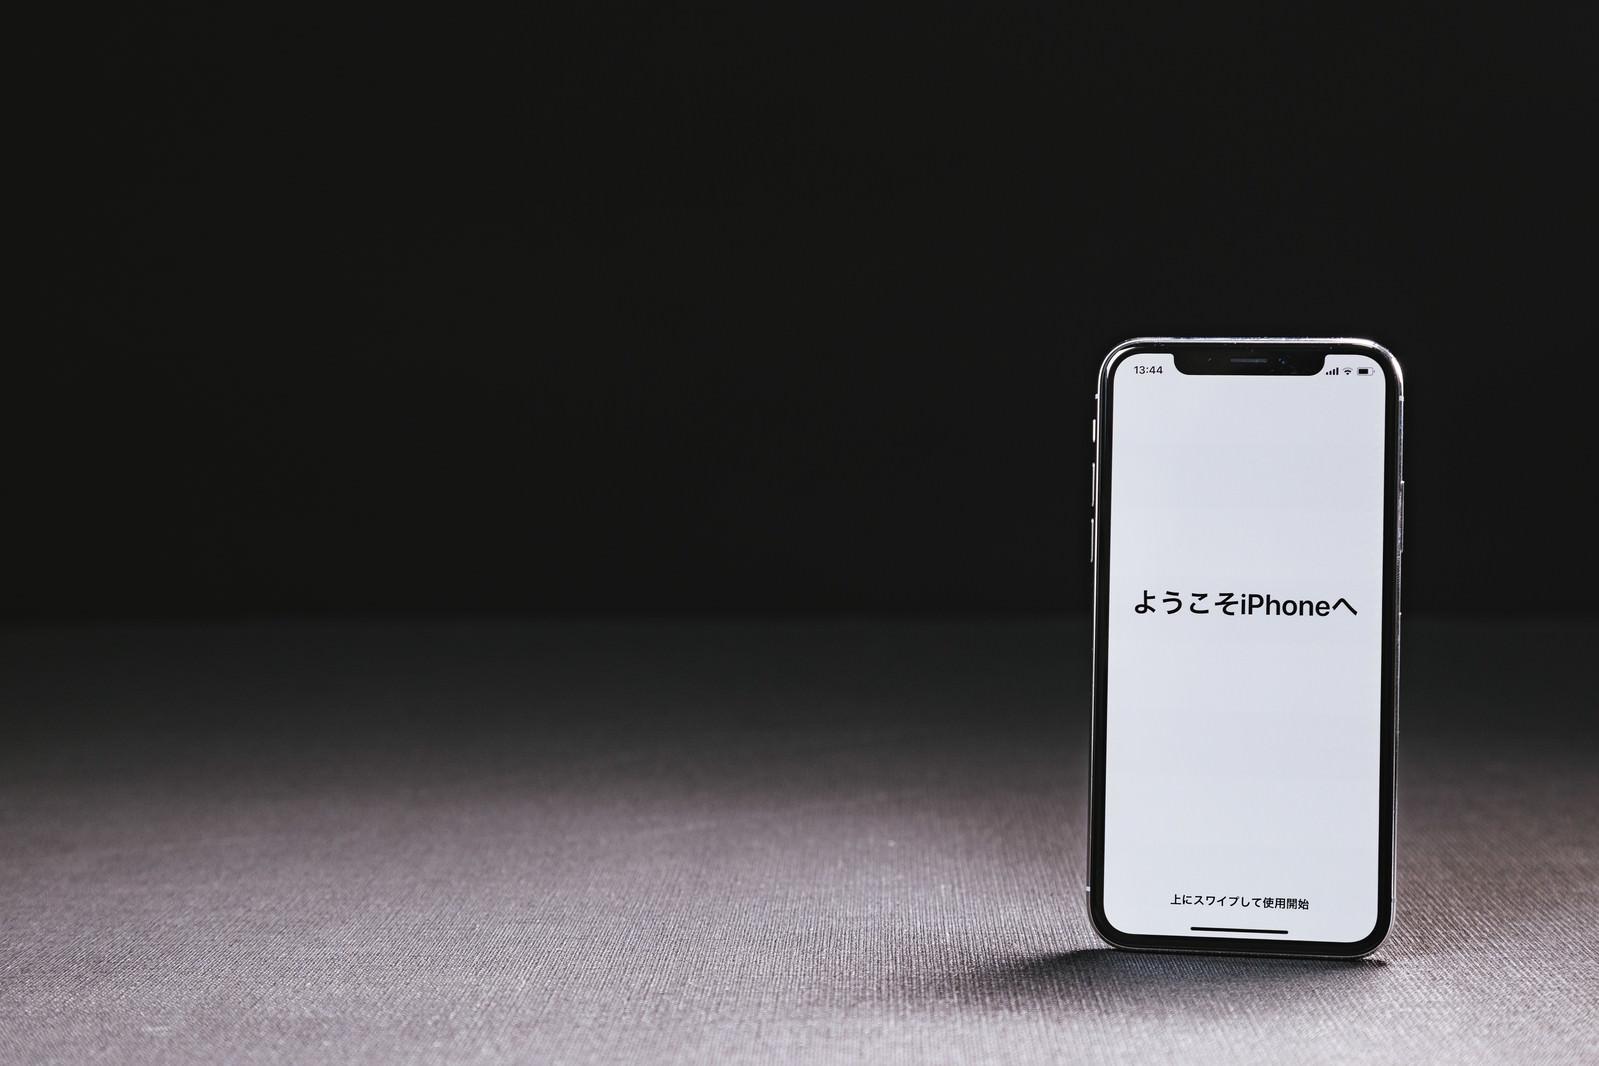 「iPhone X のようこそ画面(セットアップ) | 写真の無料素材・フリー素材 - ぱくたそ」の写真